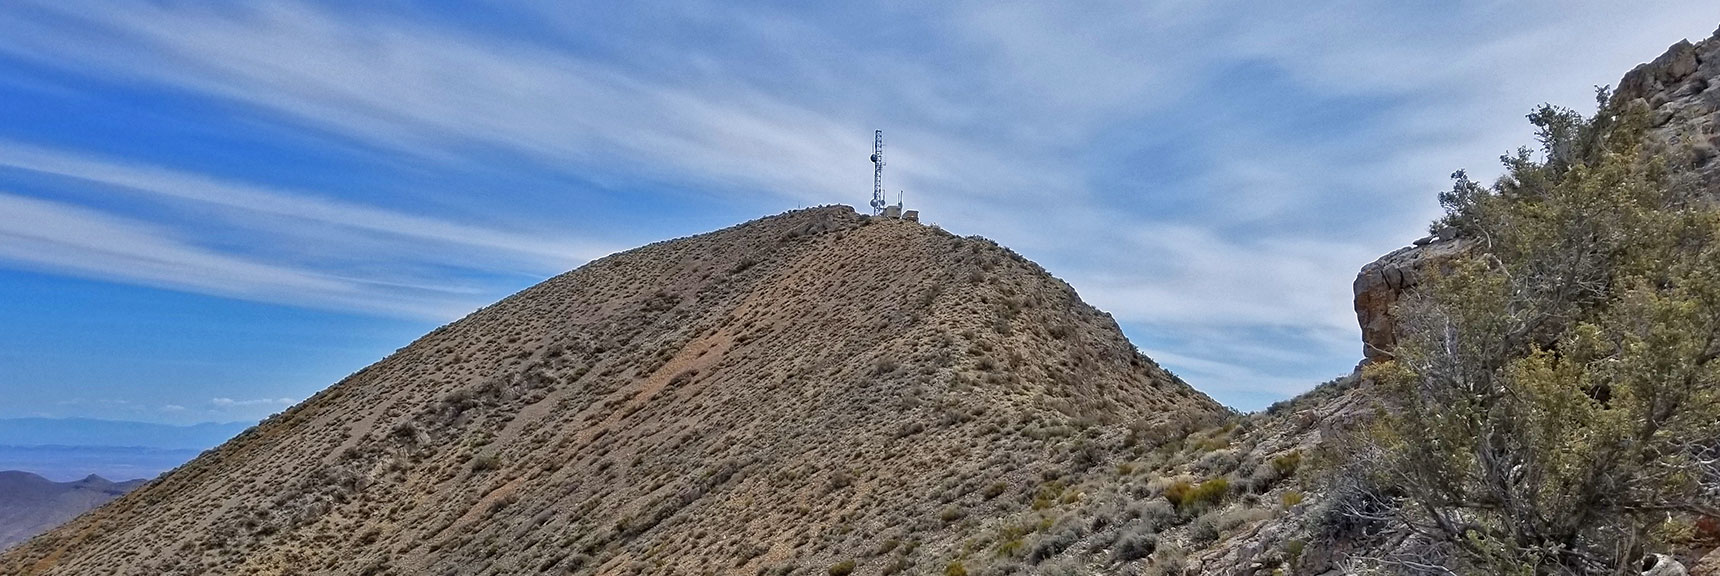 Closing in on the Gass Peak Eastern Summit from the Gass Peak Gauntlet Route | Gass Peak Eastern Summit Ultra-marathon Adventure, Nevada